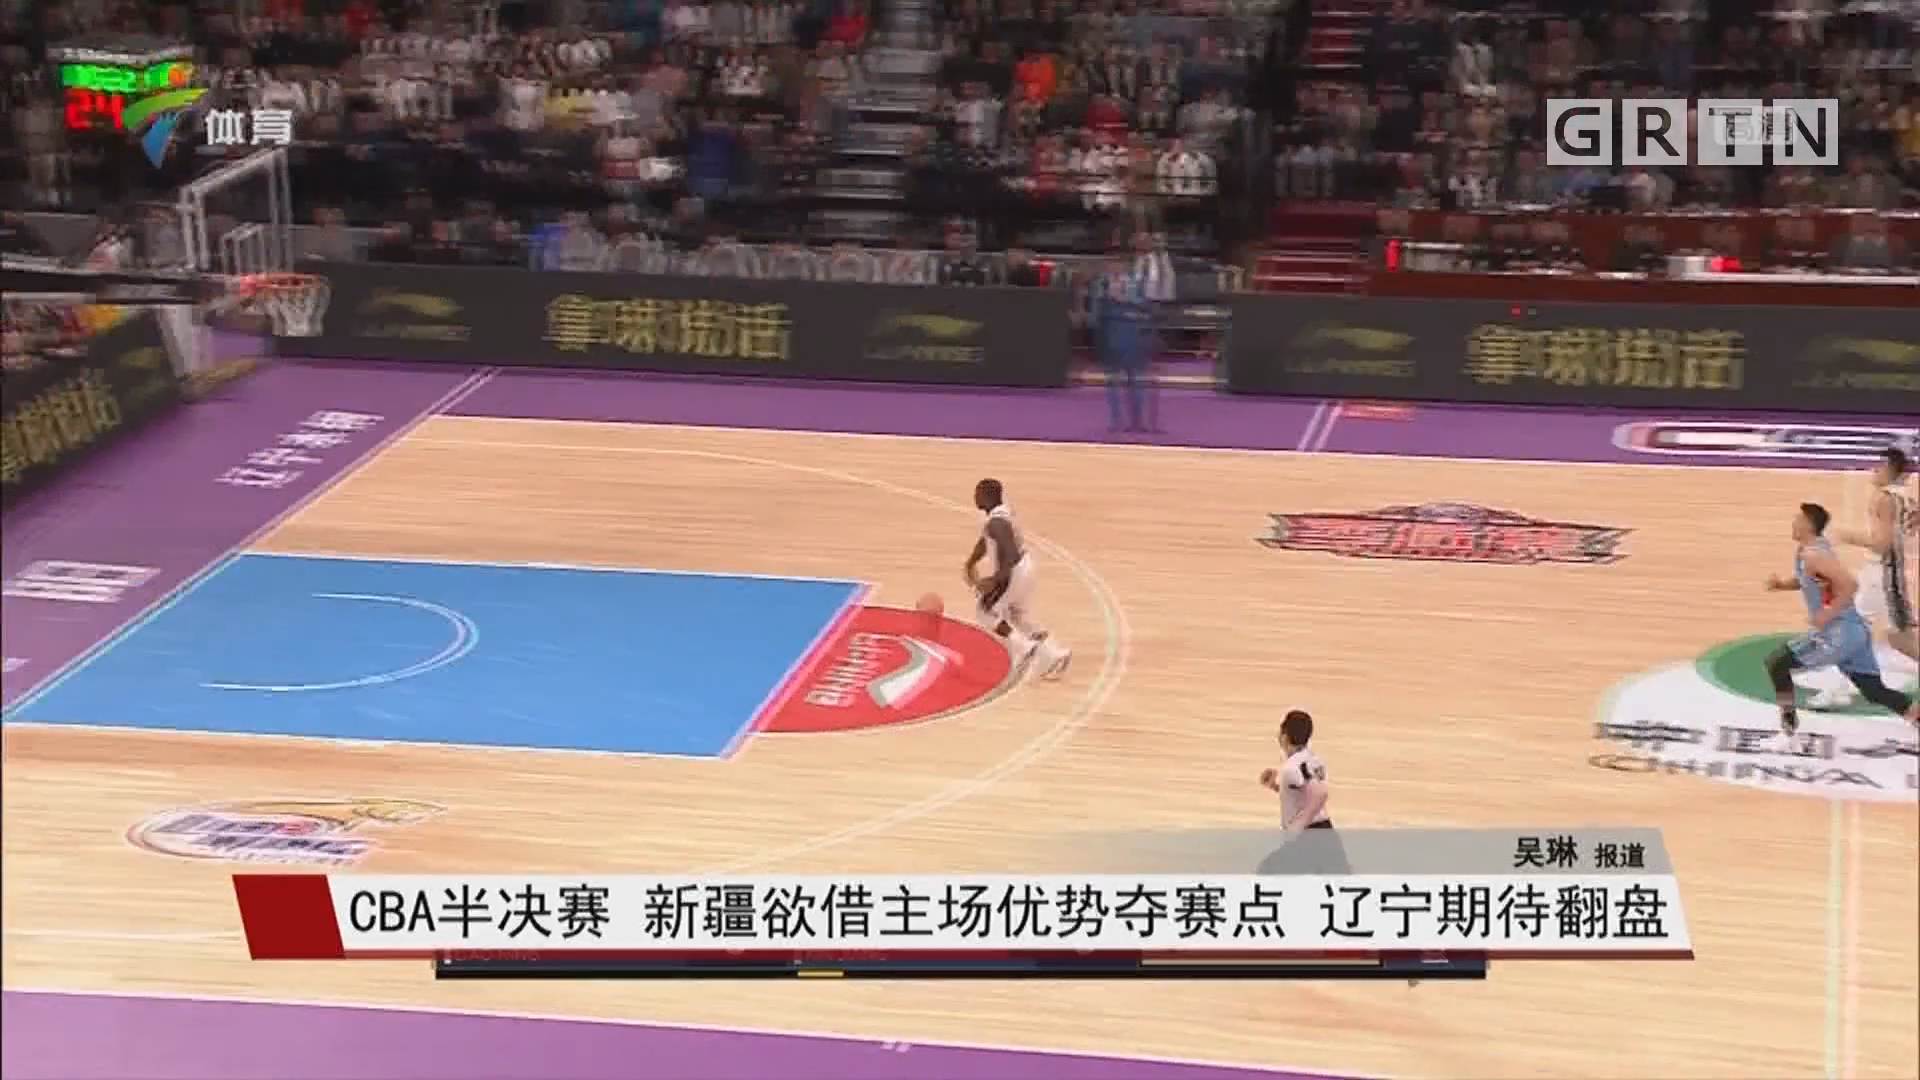 CBA半决赛 新疆欲借主场优势夺赛点 辽宁期待翻盘